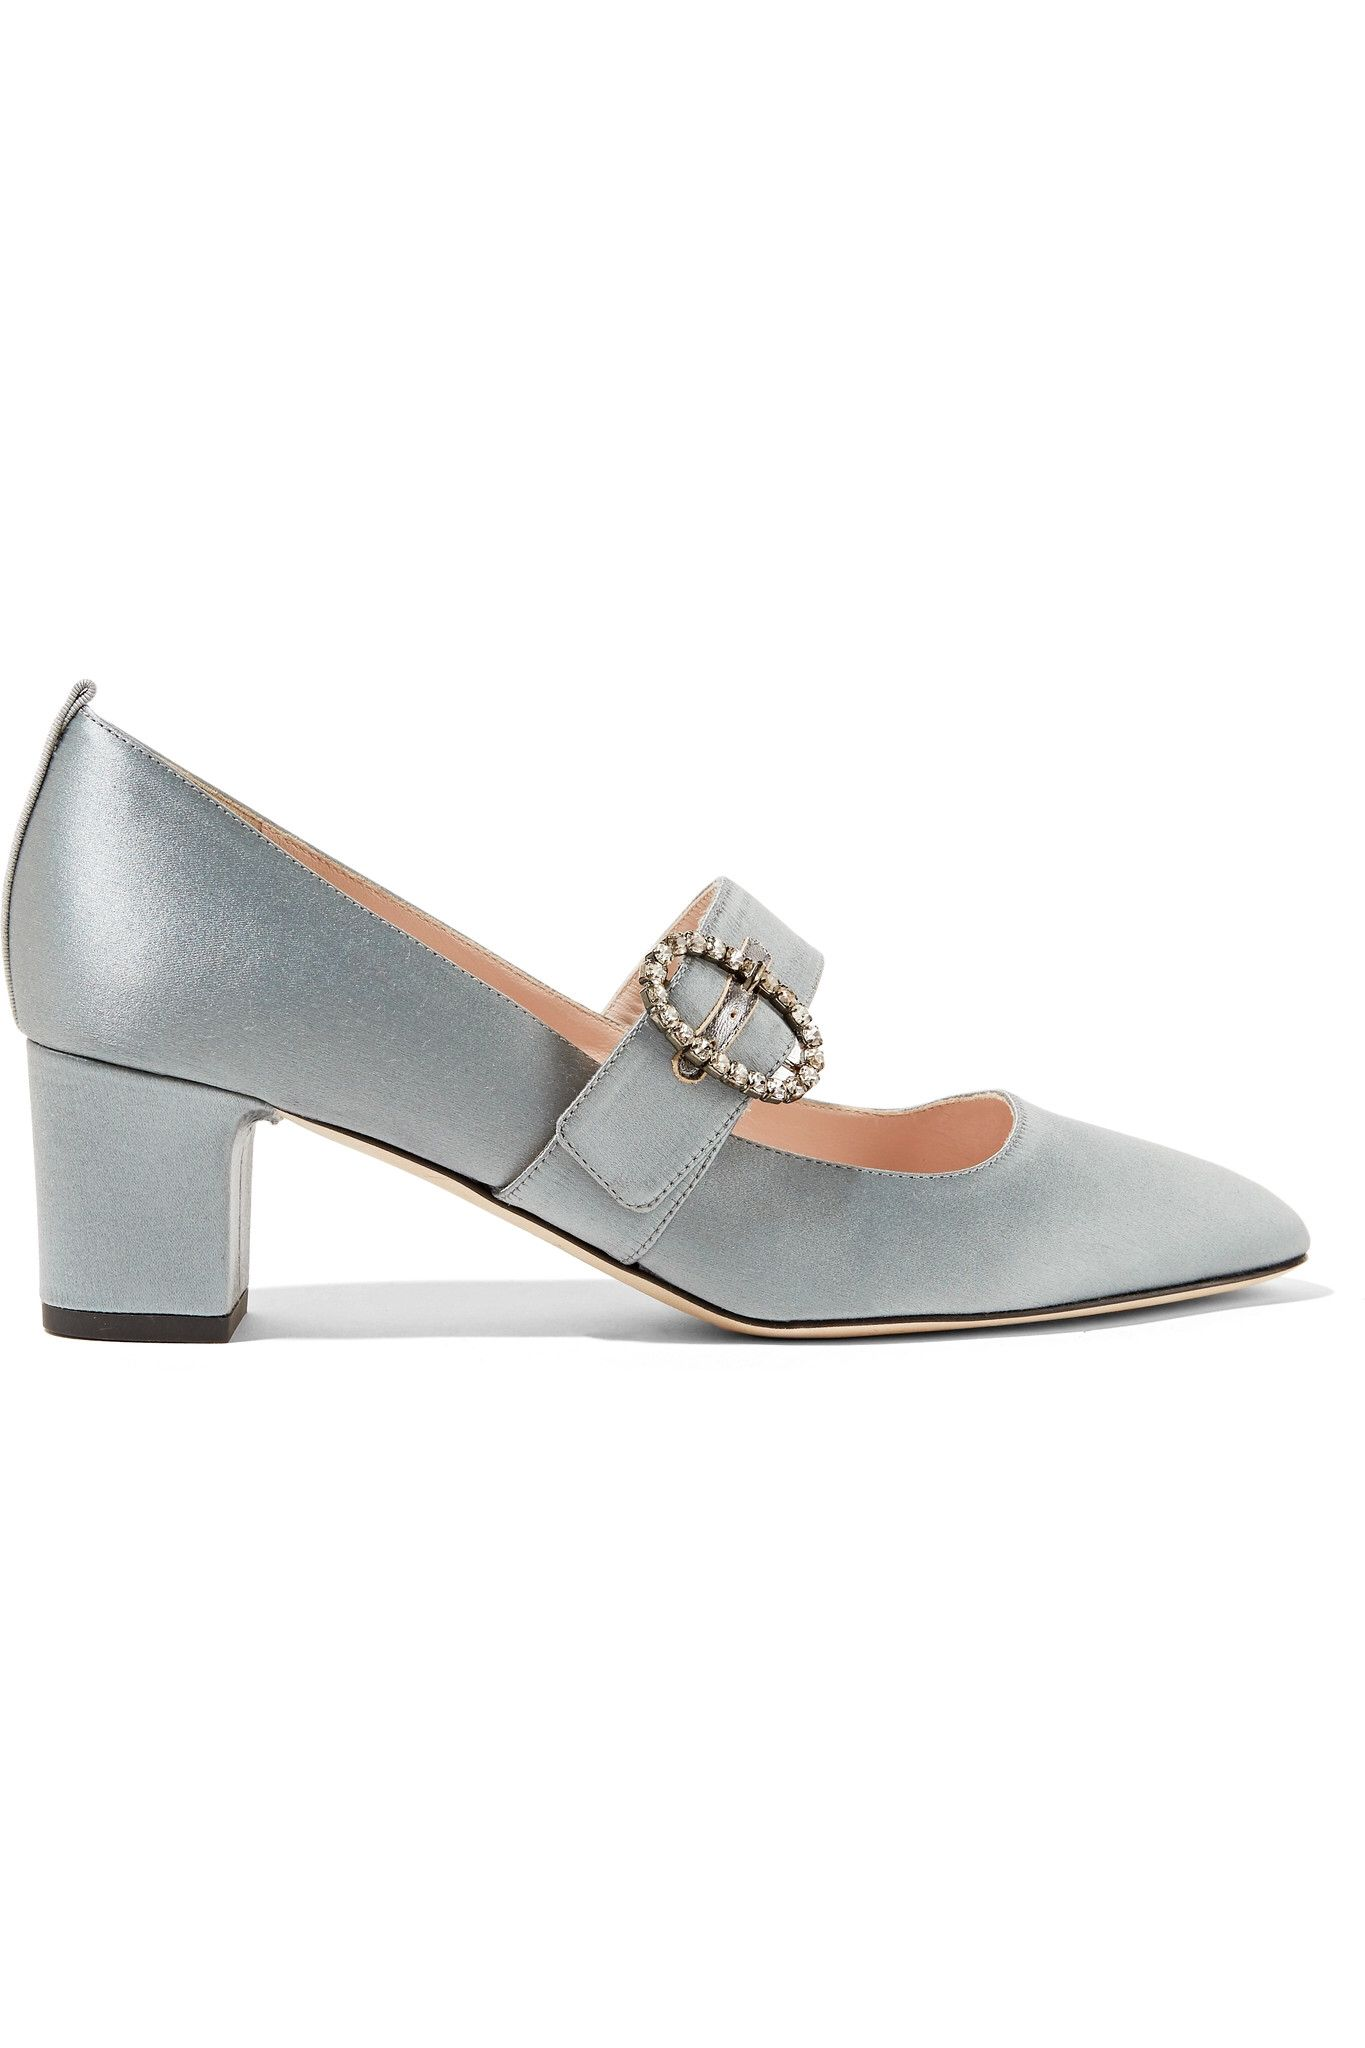 fc8563ab484 SJP Tart Holiday Shoes